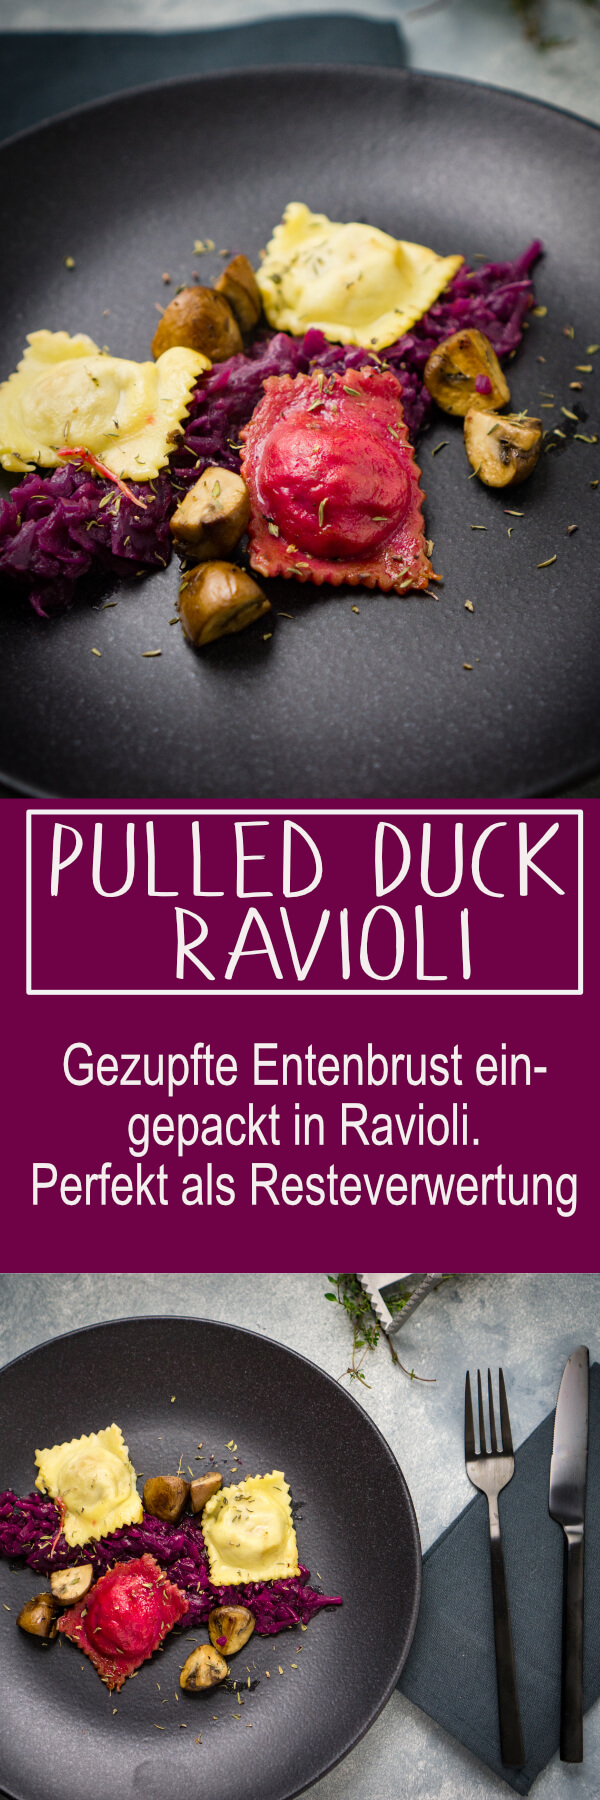 pulled-duck-ravioli